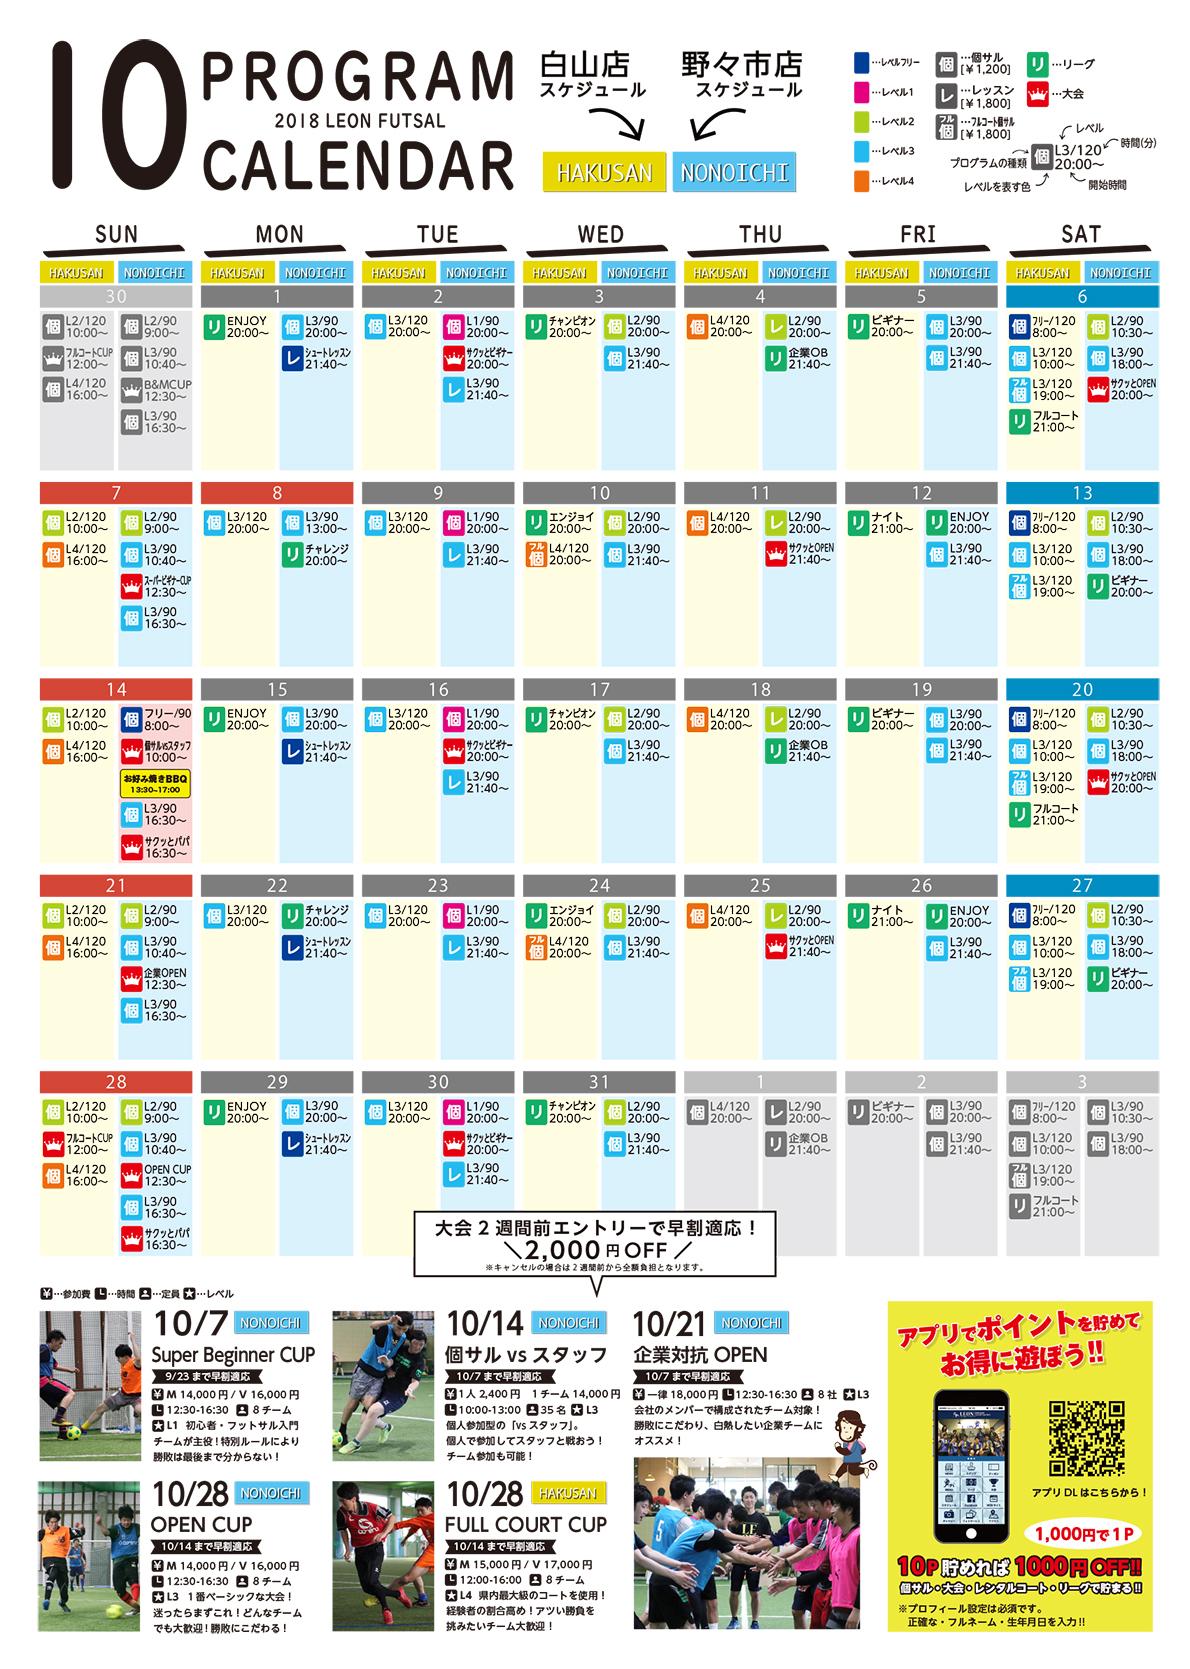 LEONの10月のスケジュール